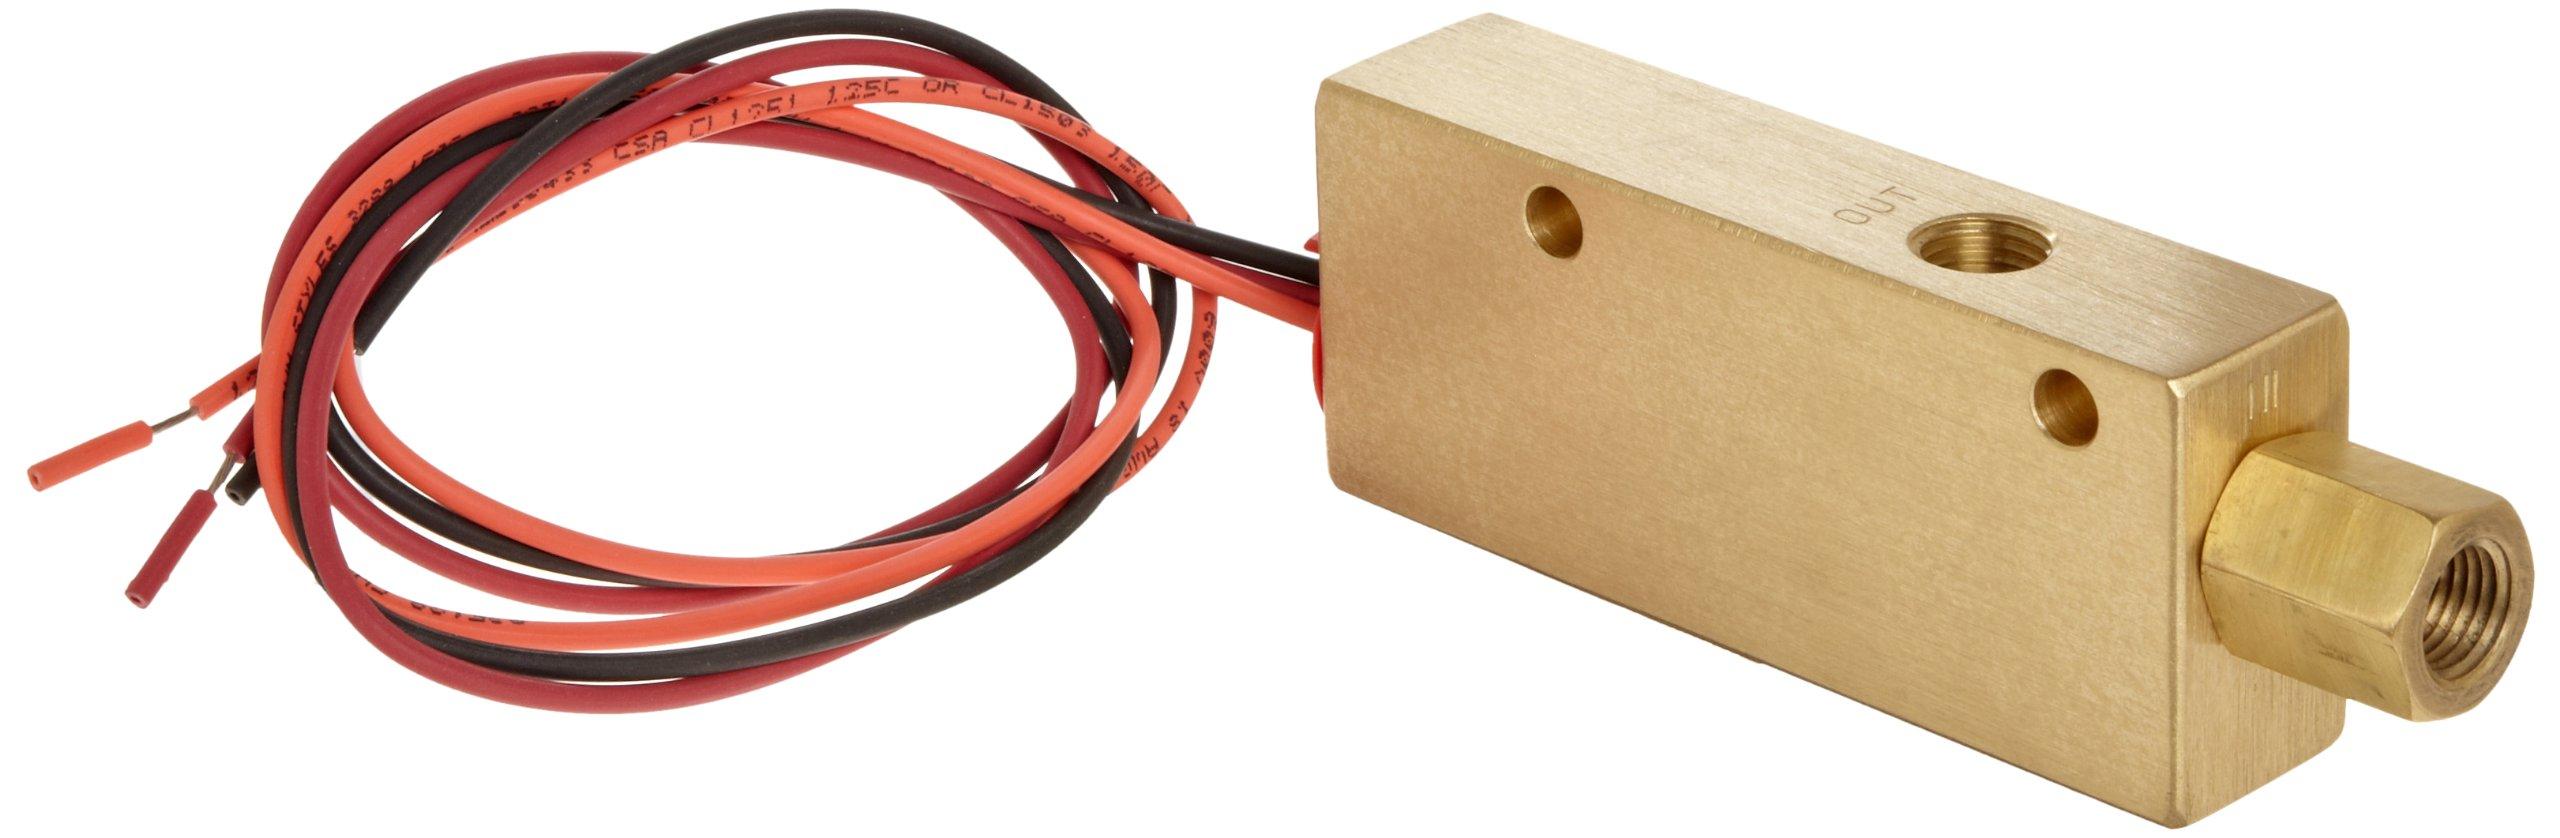 Gems Sensors FS-925 Series Brass Flow Switch, Inline, Piston Type, 0.1 gpm Flow Setting, 1/4'' NPT Female